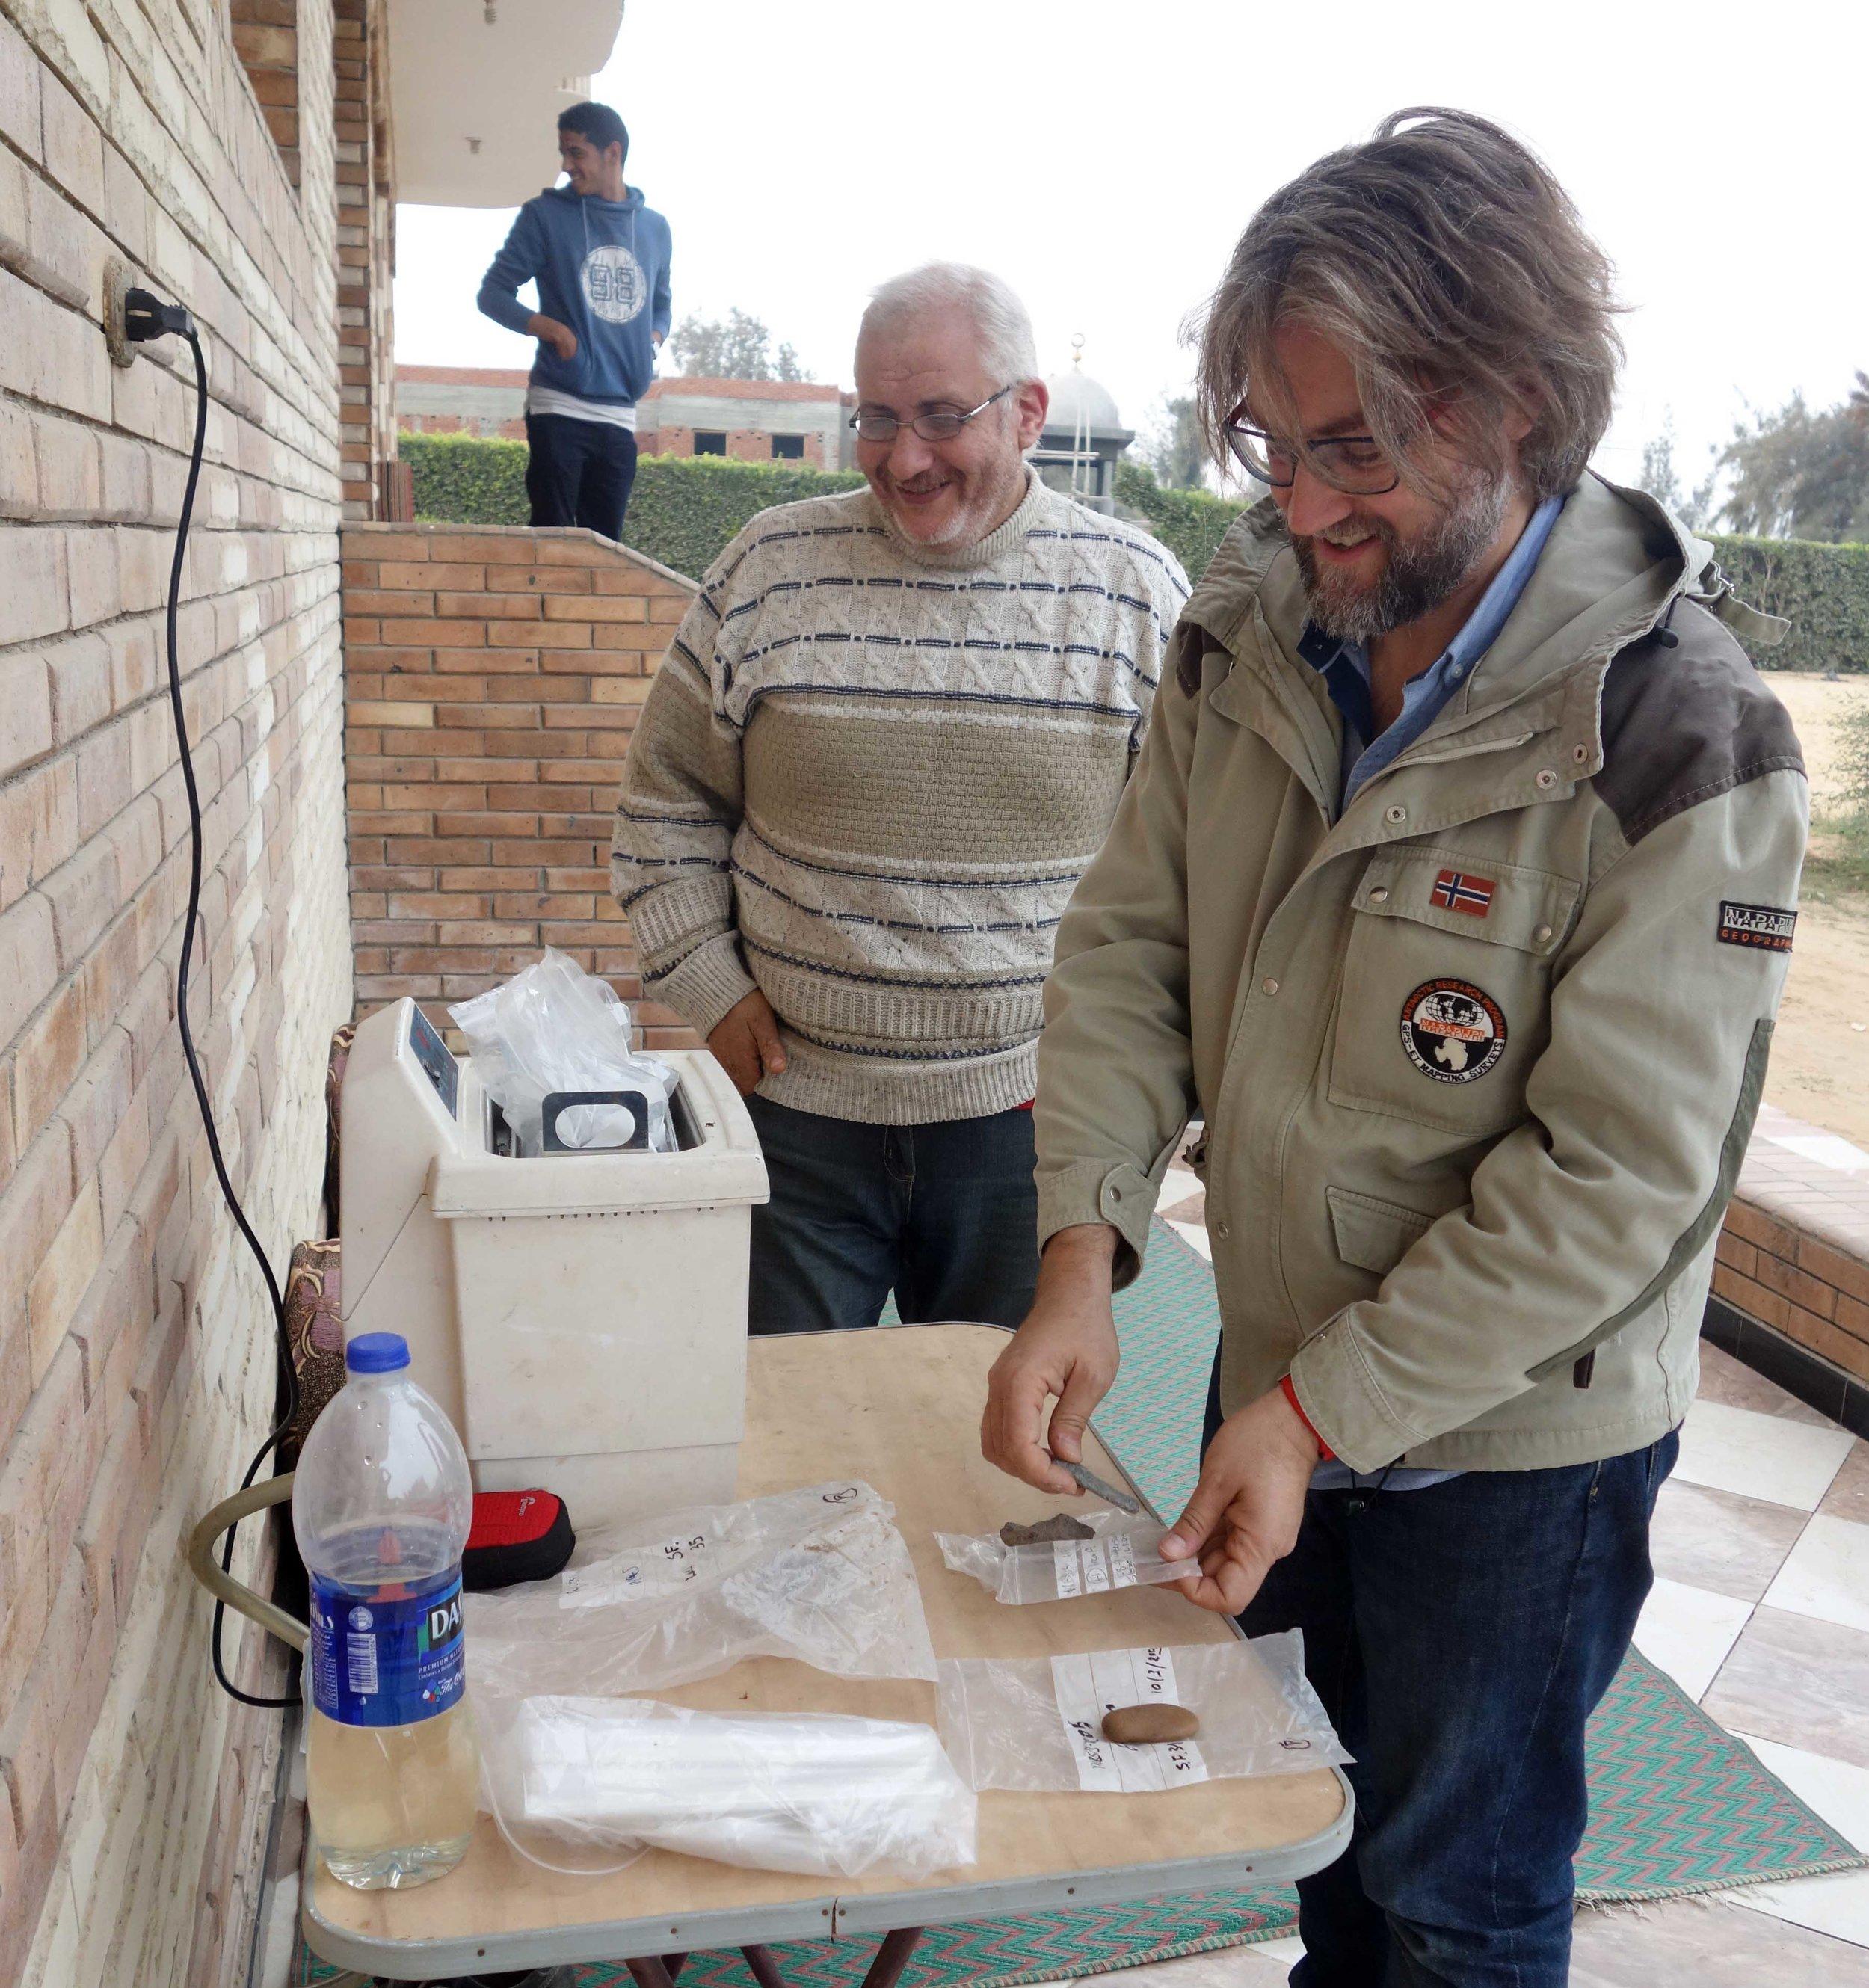 Merimde Beni Salama. Giulio Lucarini cleaning the stone tools in the ultrasonic tank (photo: Joanne Rowland; © Egypt Exploration Society)